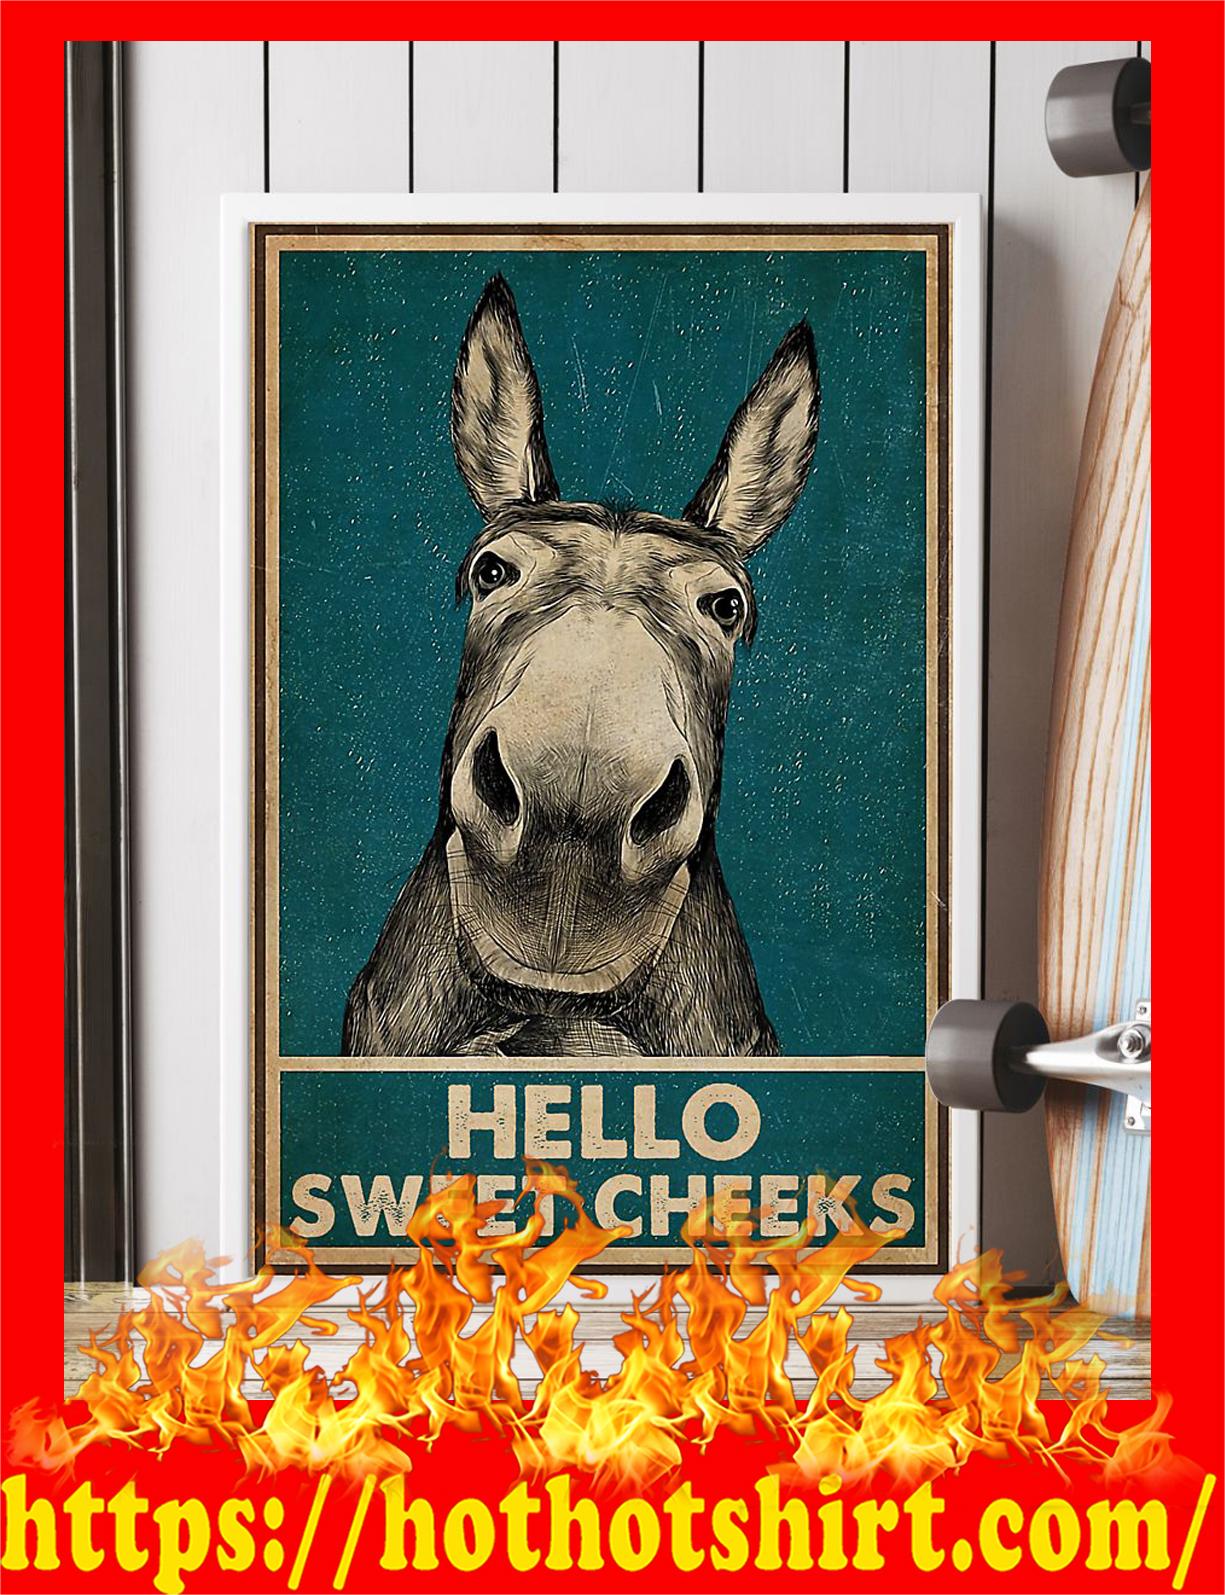 Donkey hello sweet cheeks poster - Pic 1